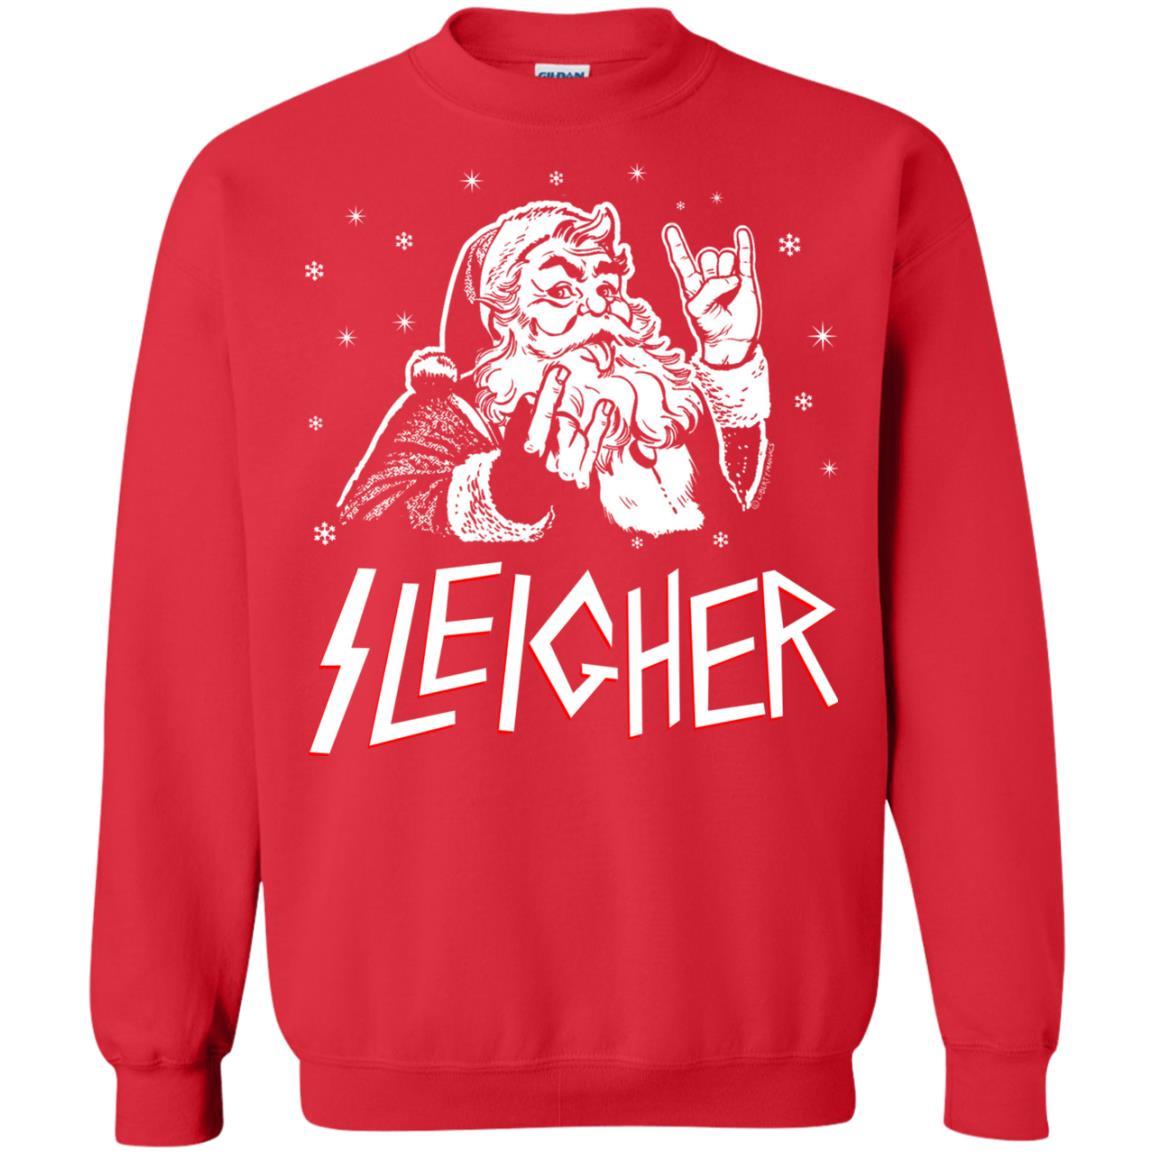 Funny Christmas Sweater.Santa Sleigher Christmas Sweater Funny Christmas Shirt